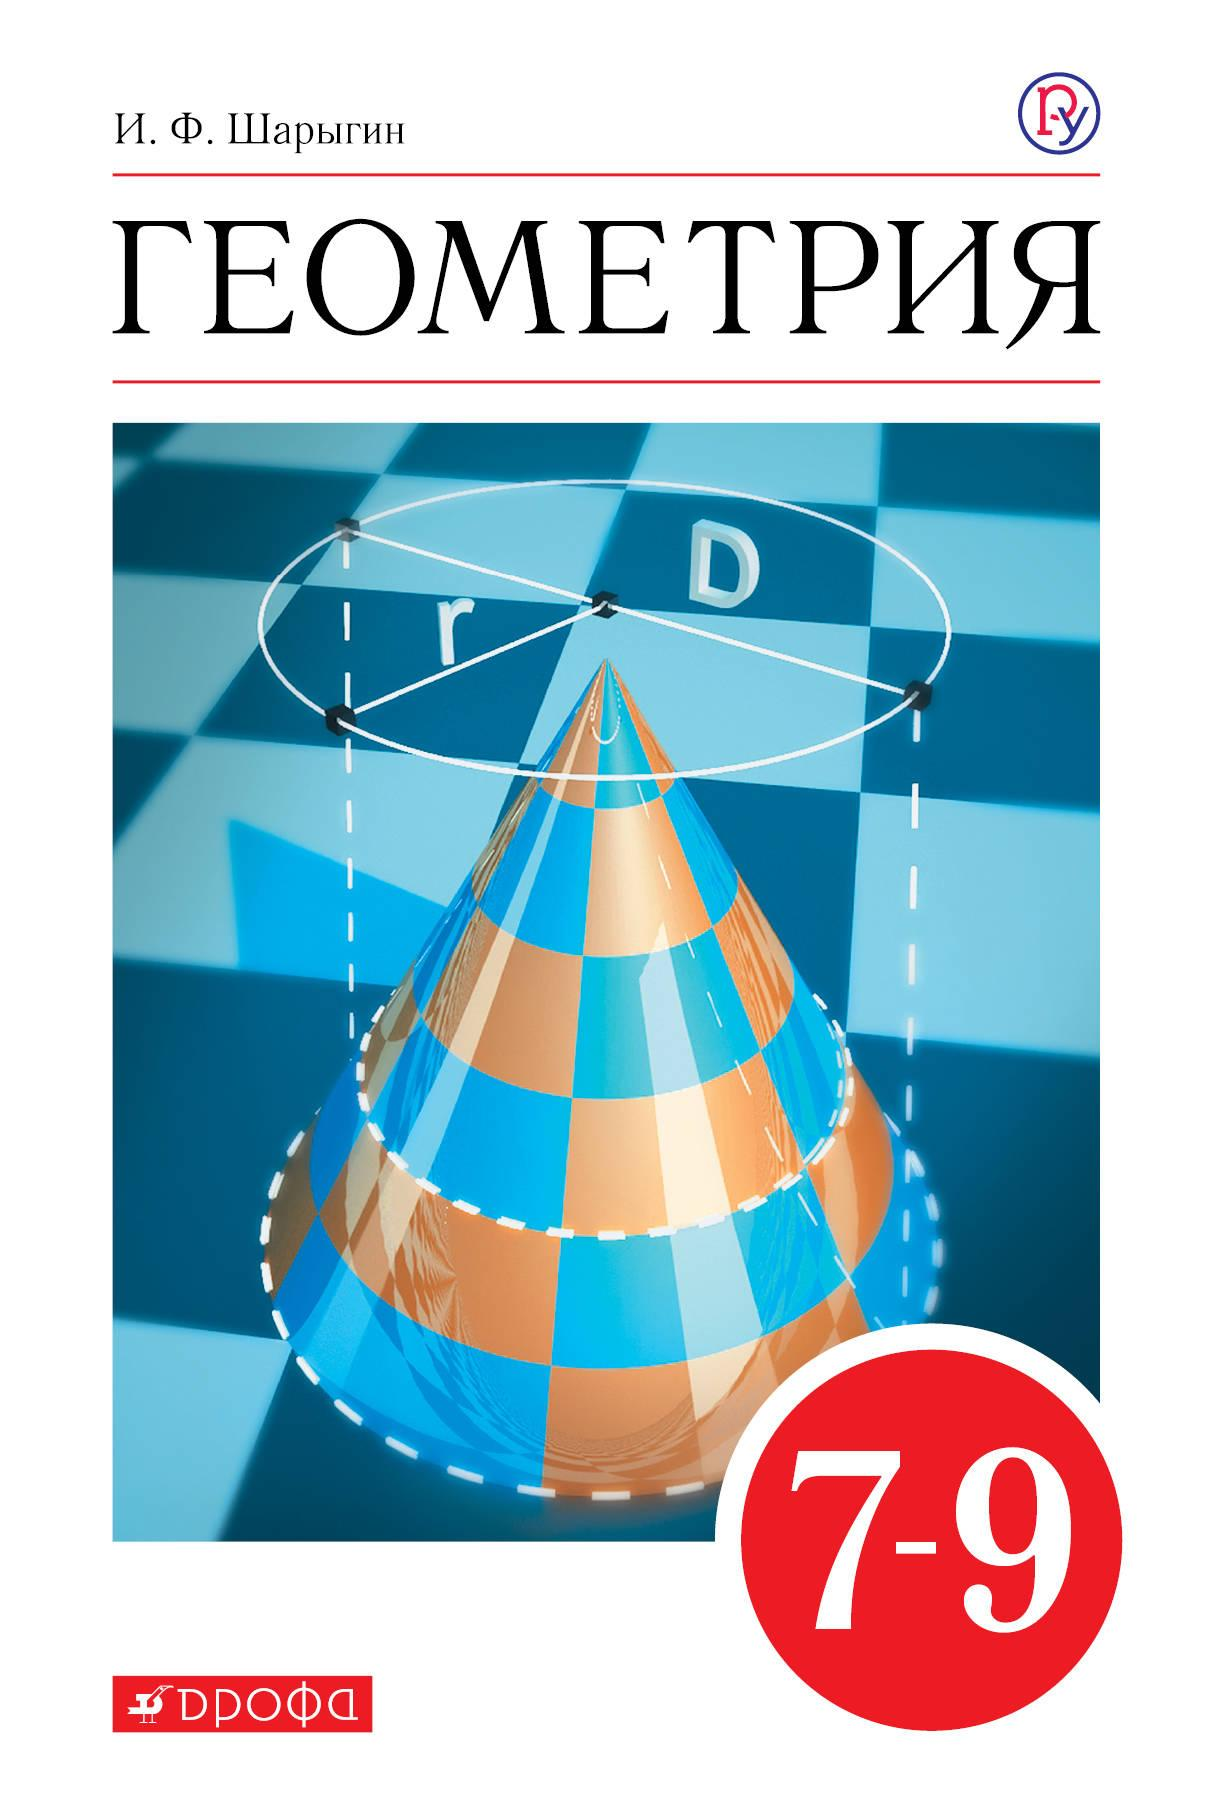 Geometrija. 7-9 klassy. Uchebnik